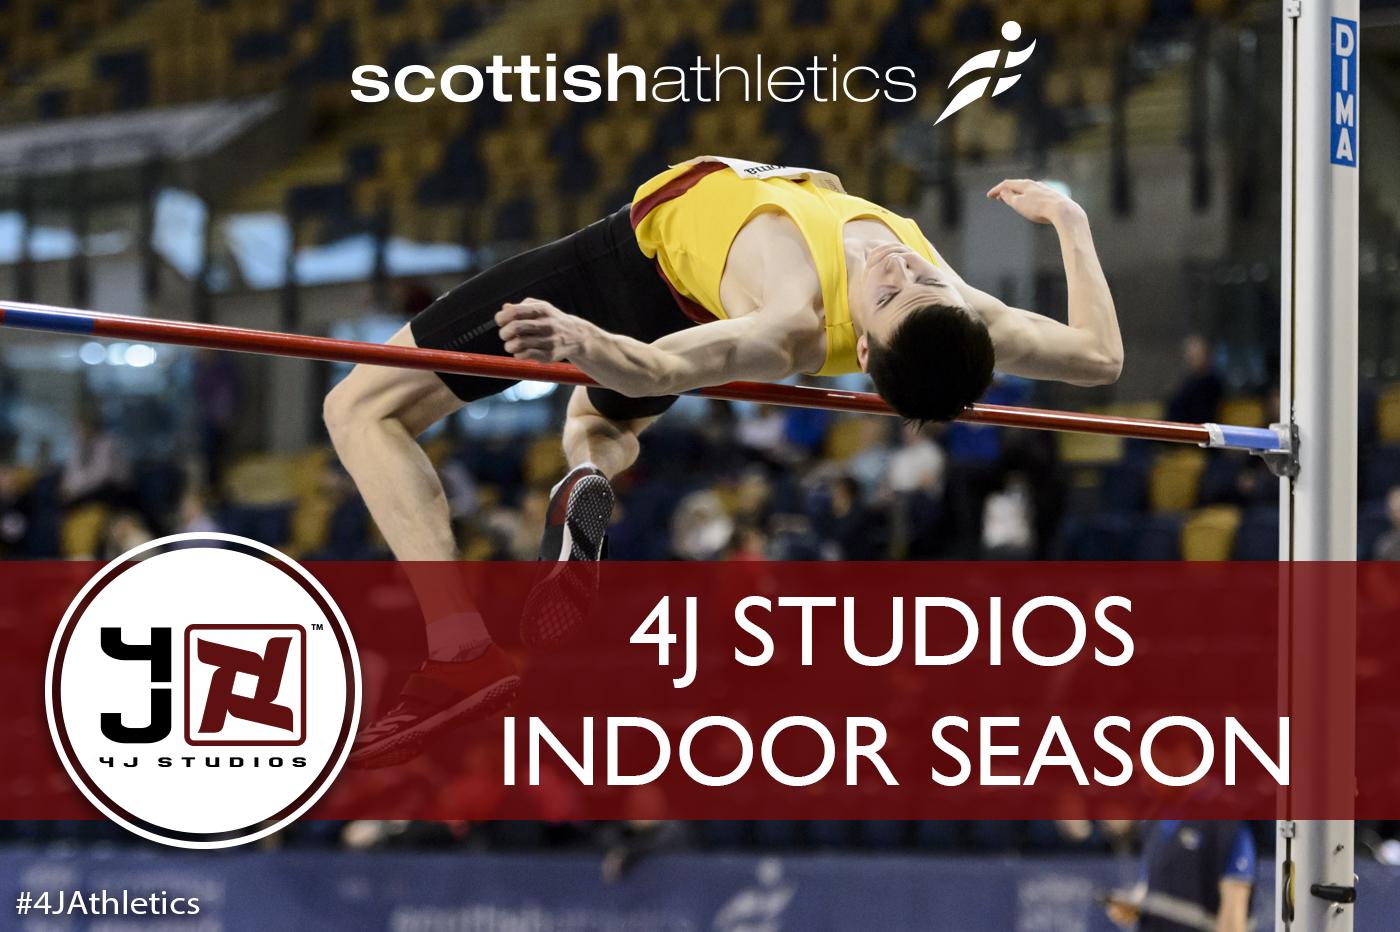 Clubs - enter now for 4J Studios SUPERteams! - Scottish Athletics